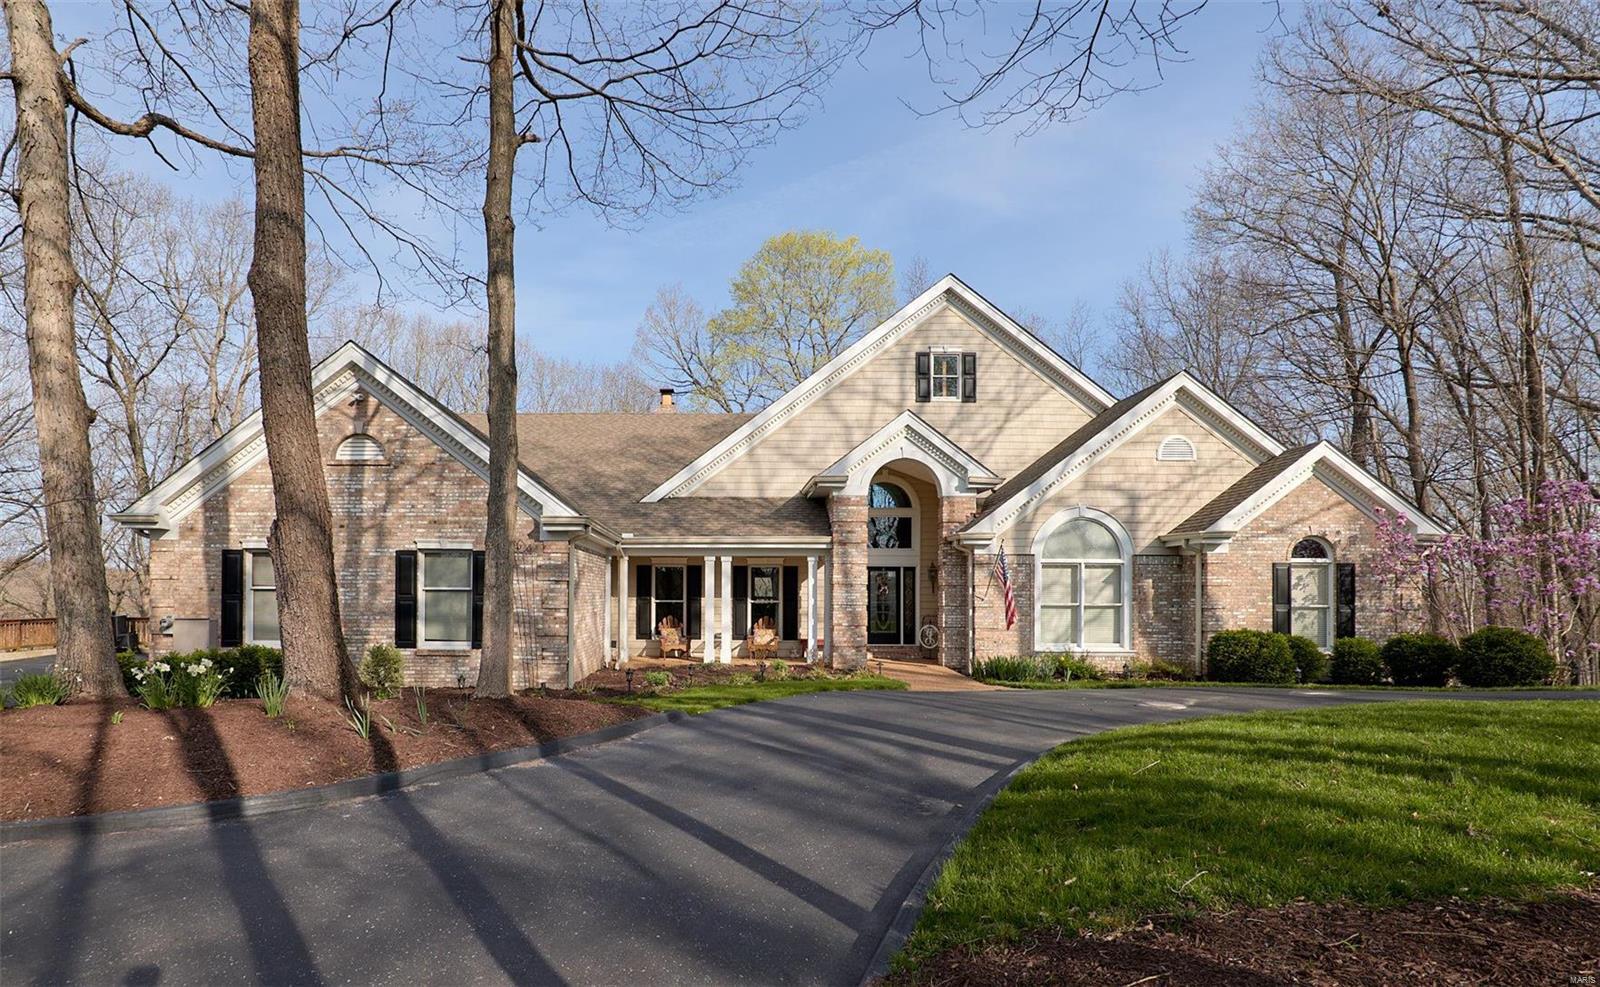 2362 Brookhollow Property Photo - Glencoe, MO real estate listing